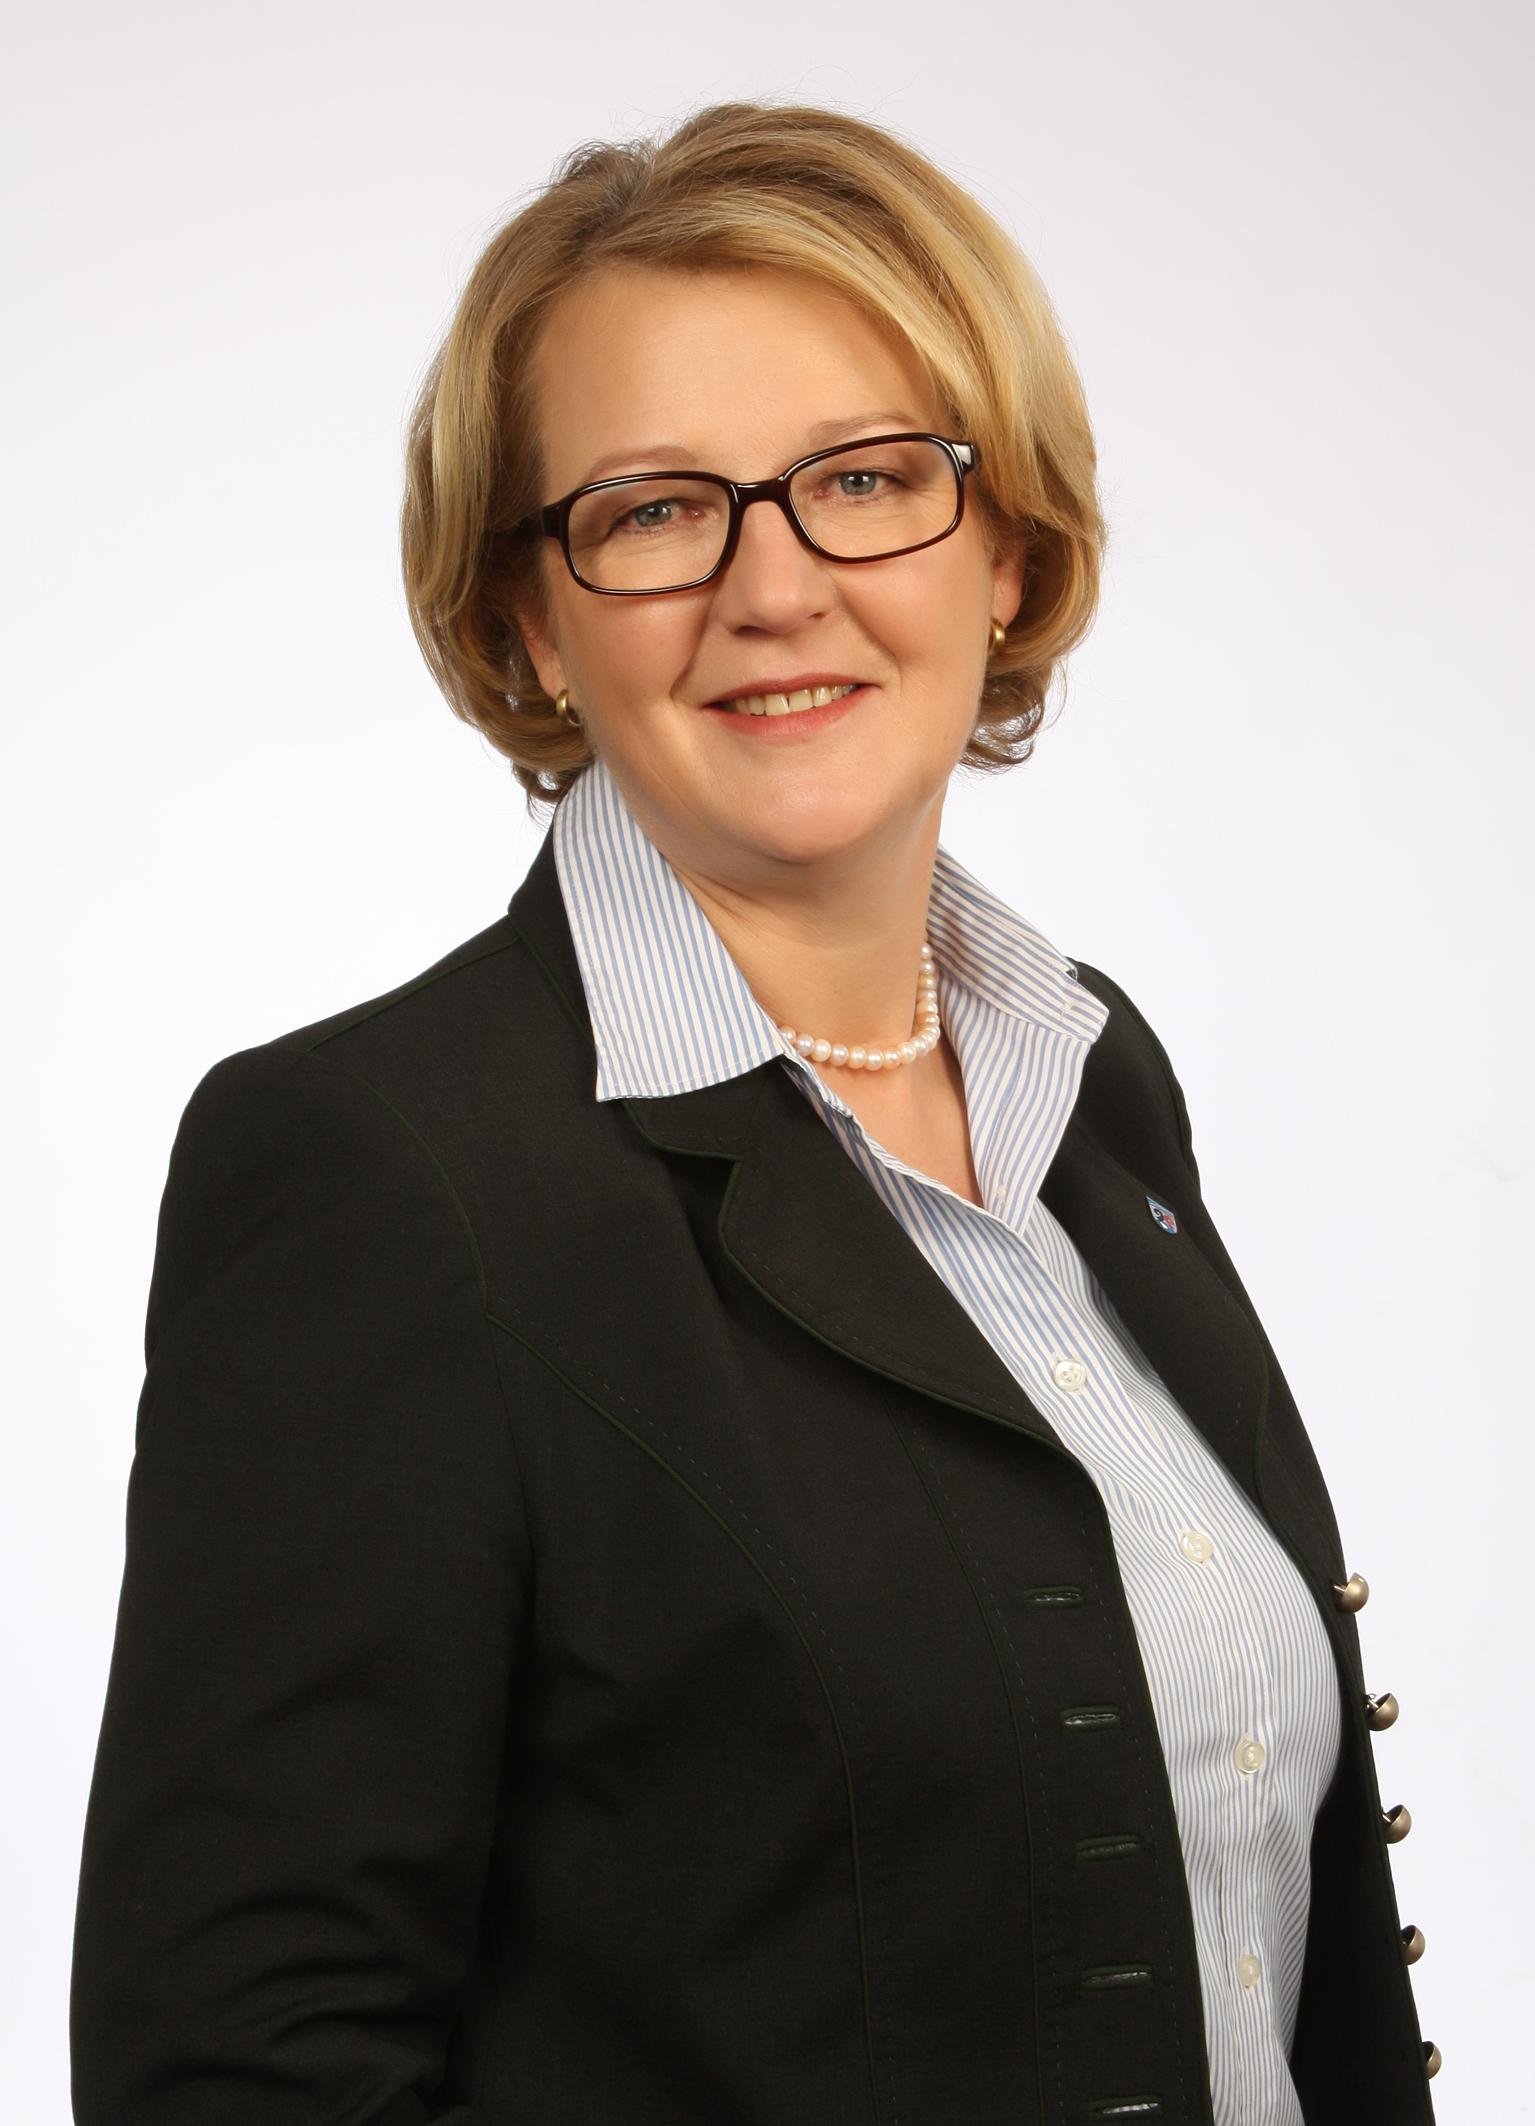 Erste Bürgermeisterin Luise Hausberger